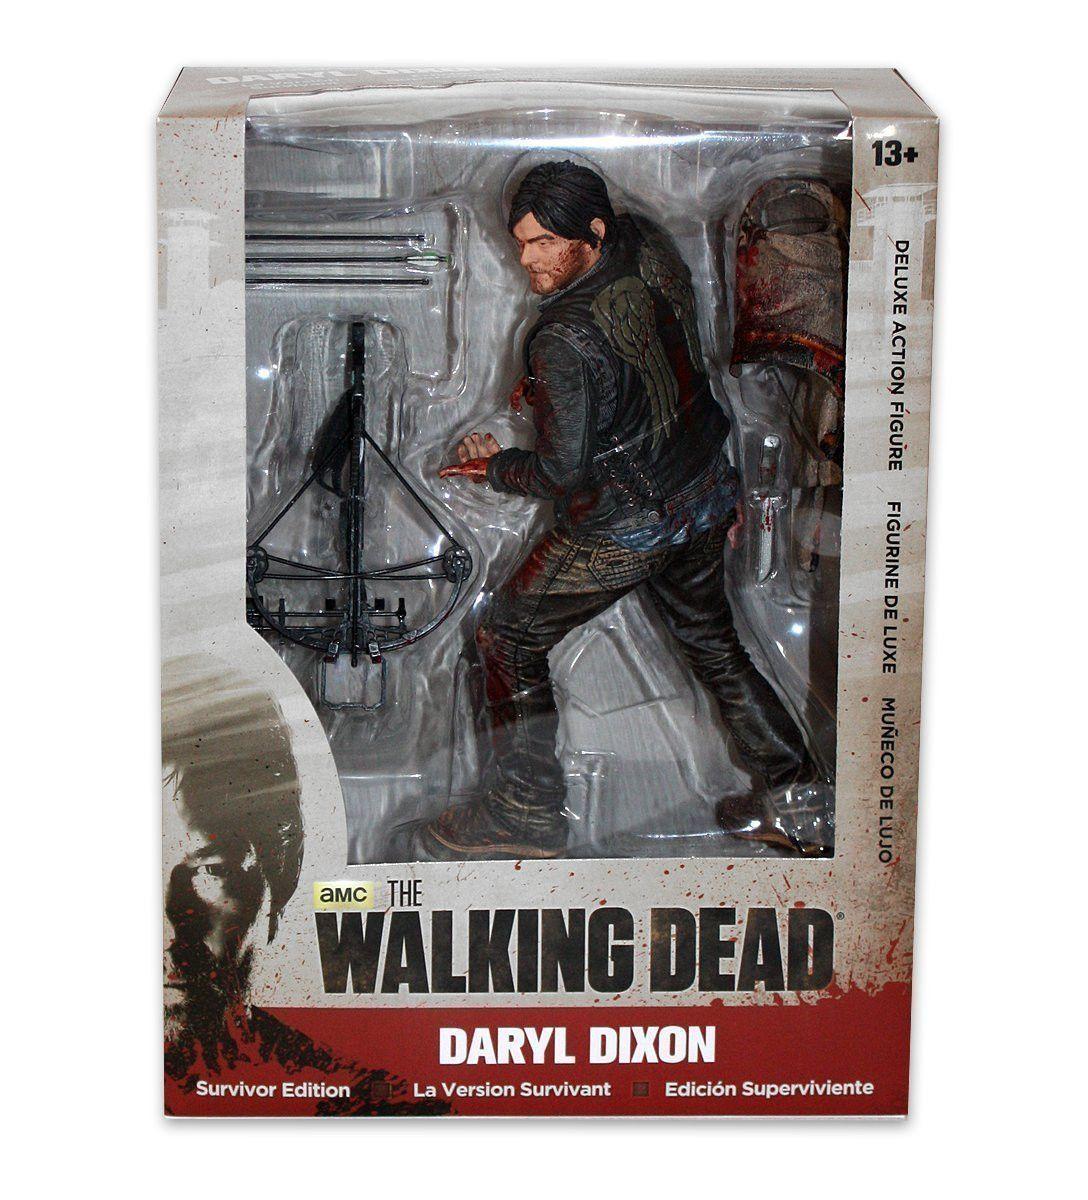 Mcfarlane walking dead series 6 daryl dixon action figure - Mcfarlane Toys The Walking Dead Survivor Daryl Dixon Deluxe Action Figure